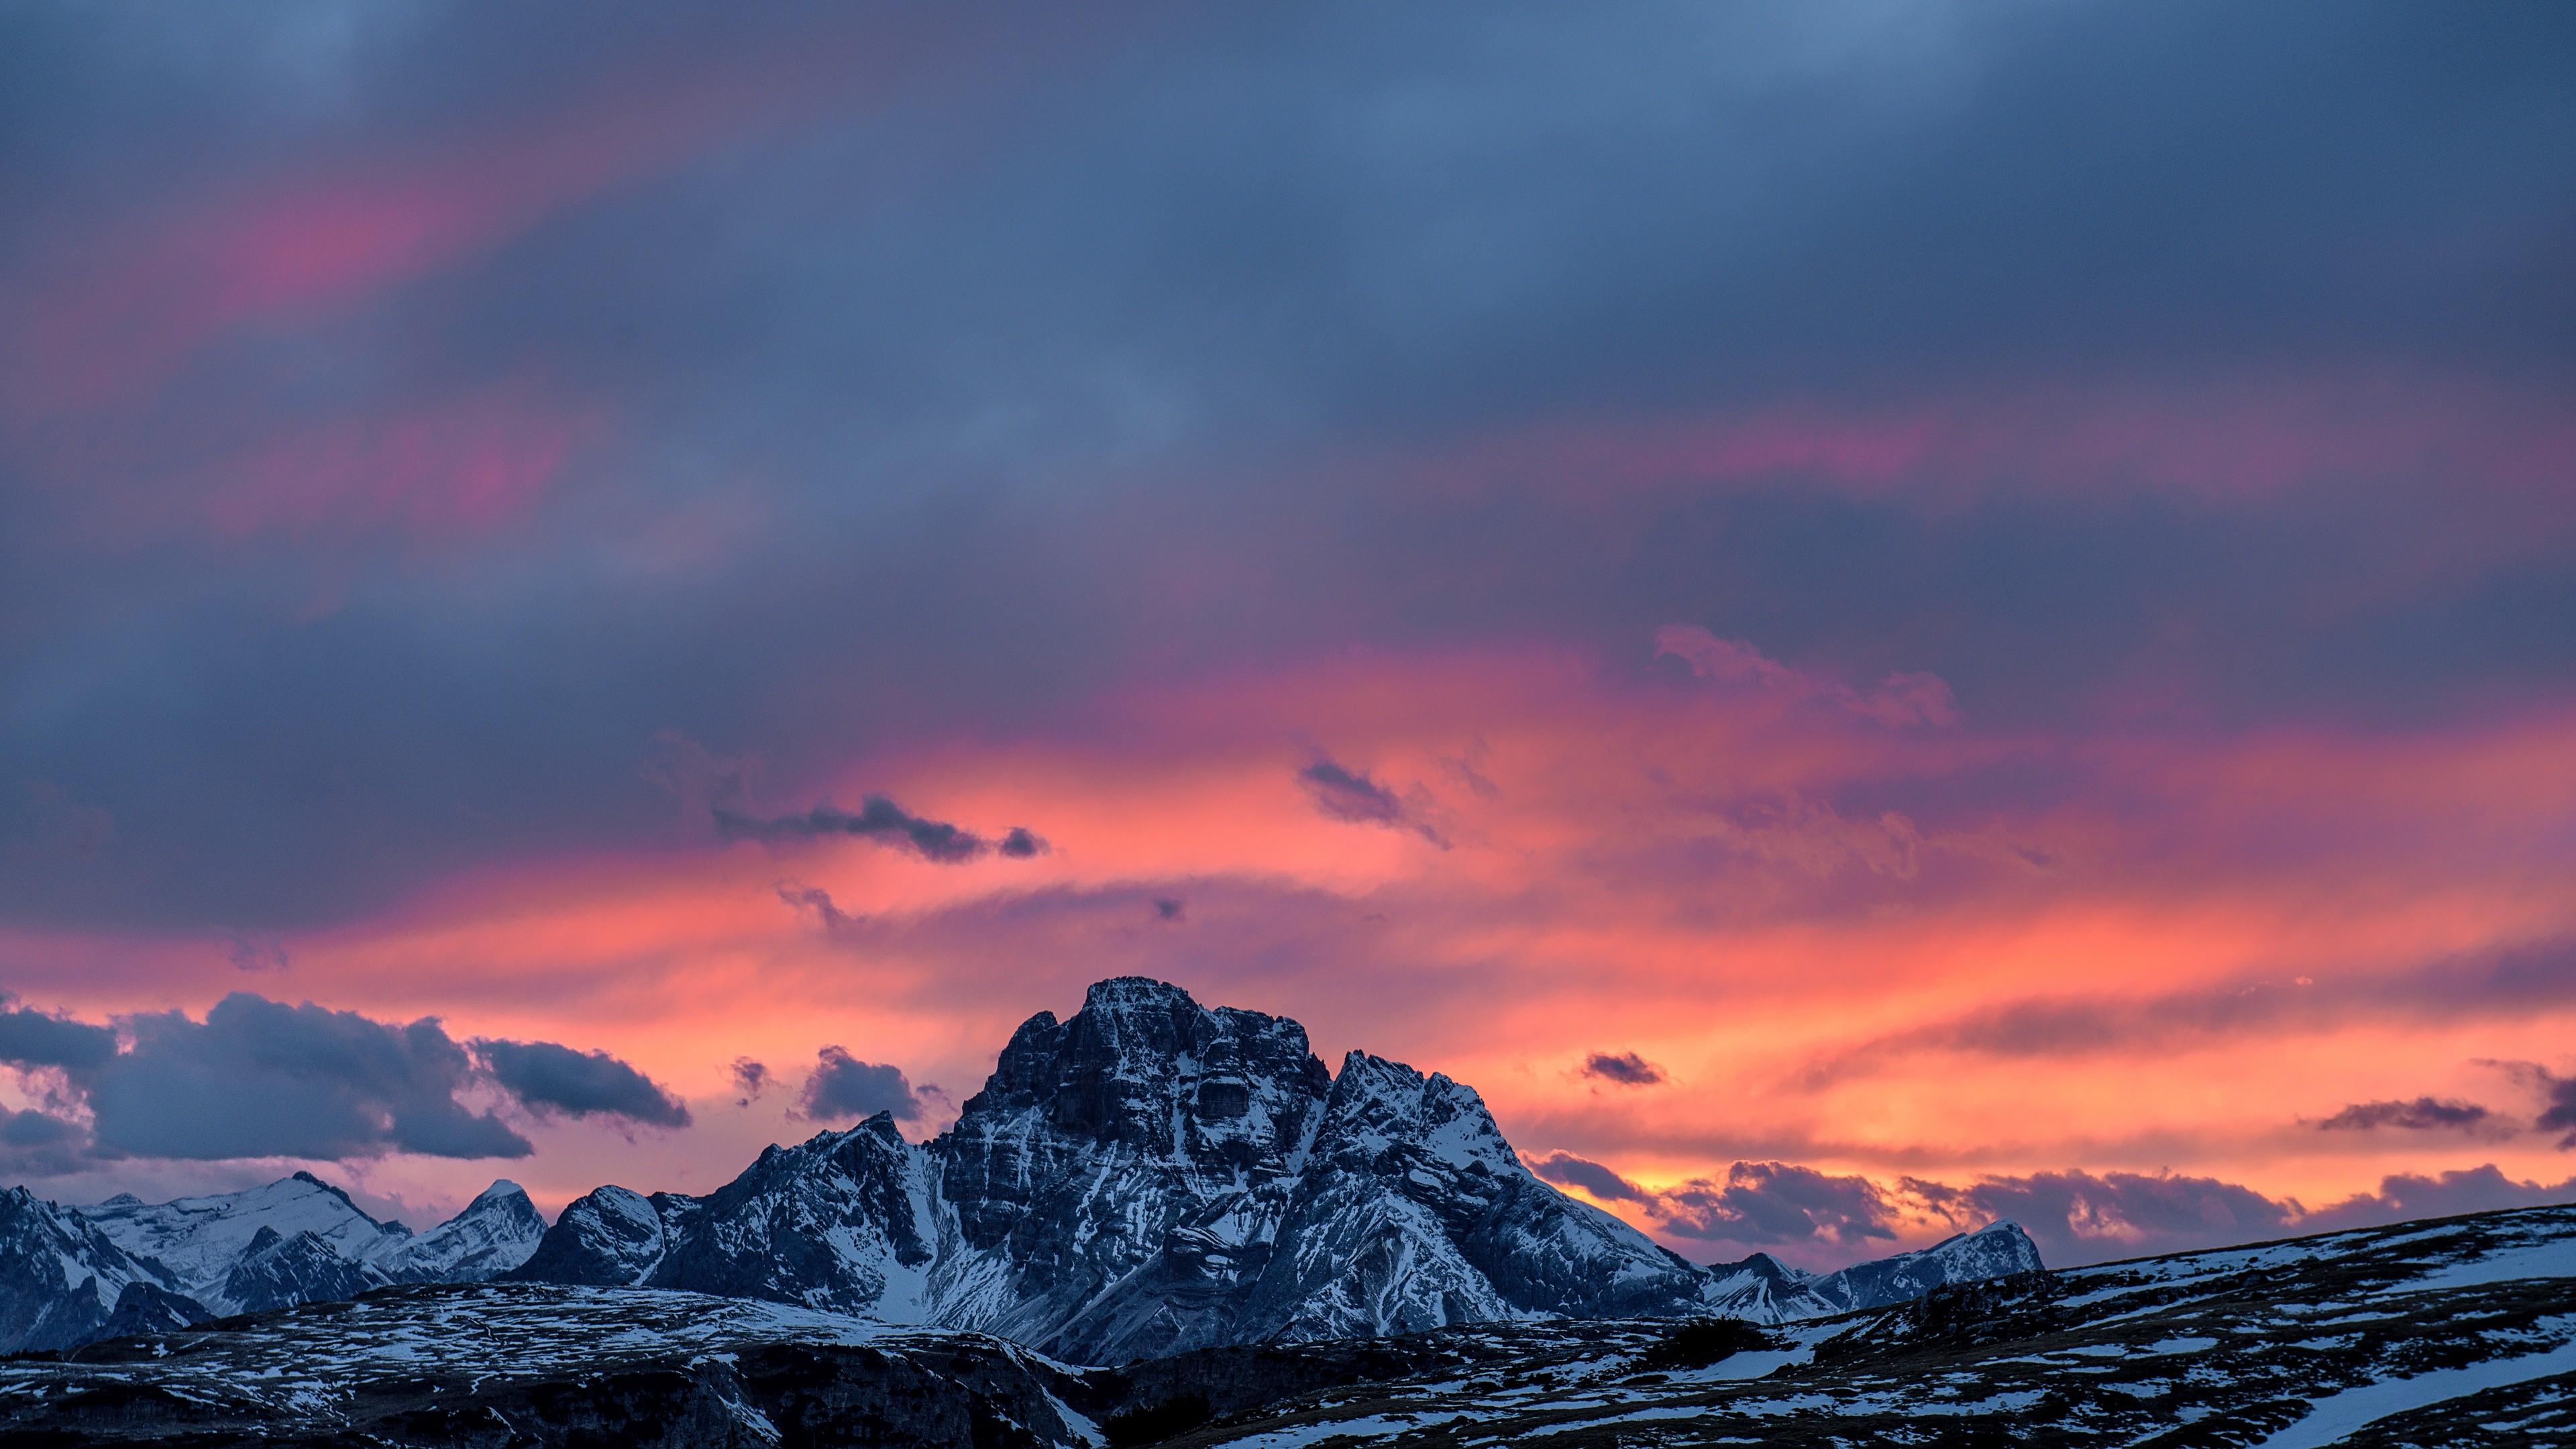 4k Mountains Sunset Peaks Wallpaper 3840x2160